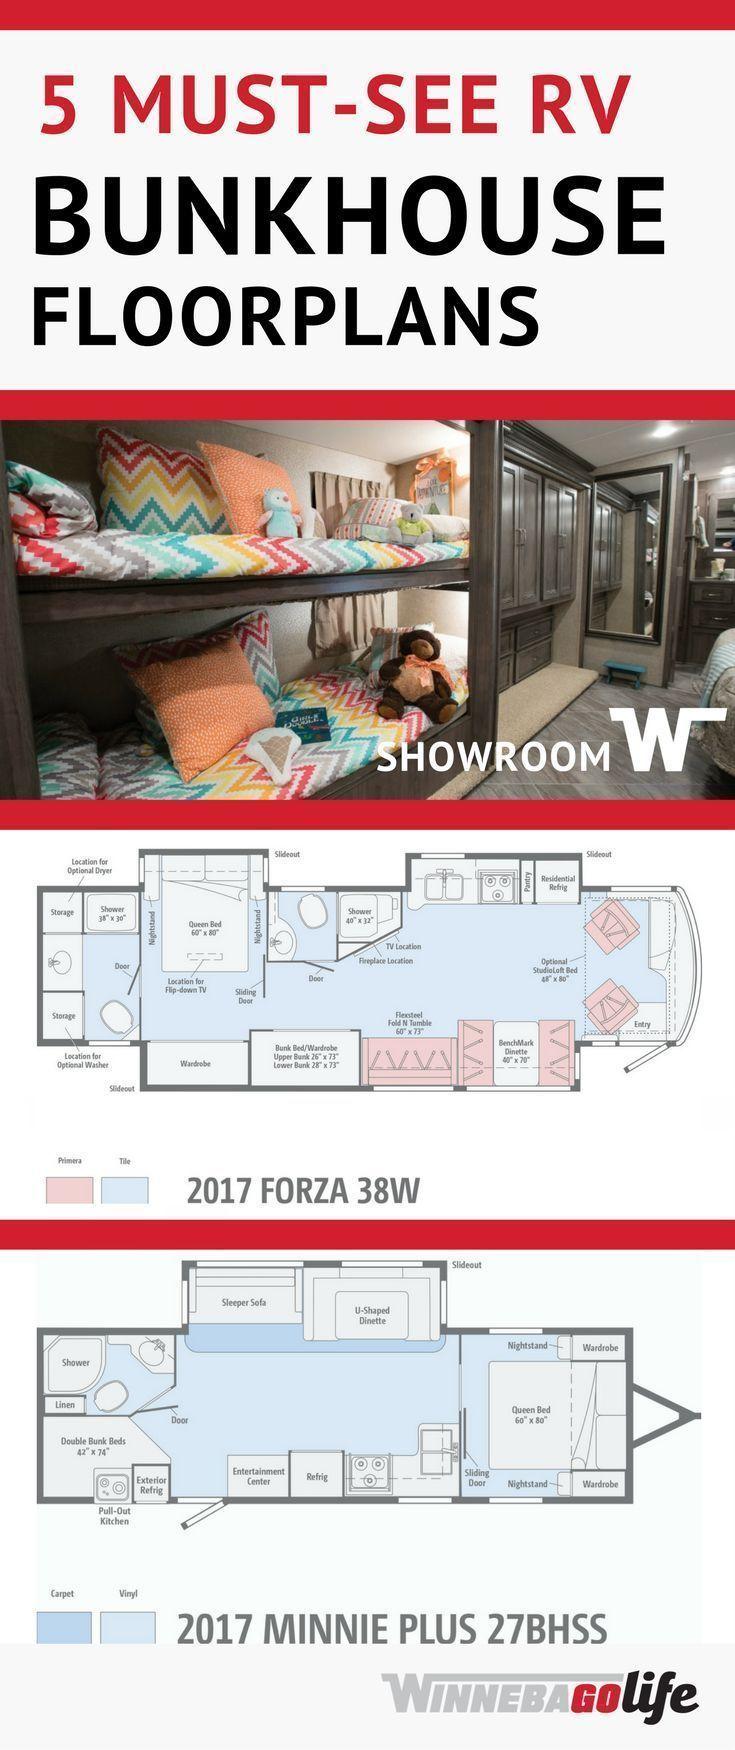 5 Must-See RV Bunkhouse Floorplans